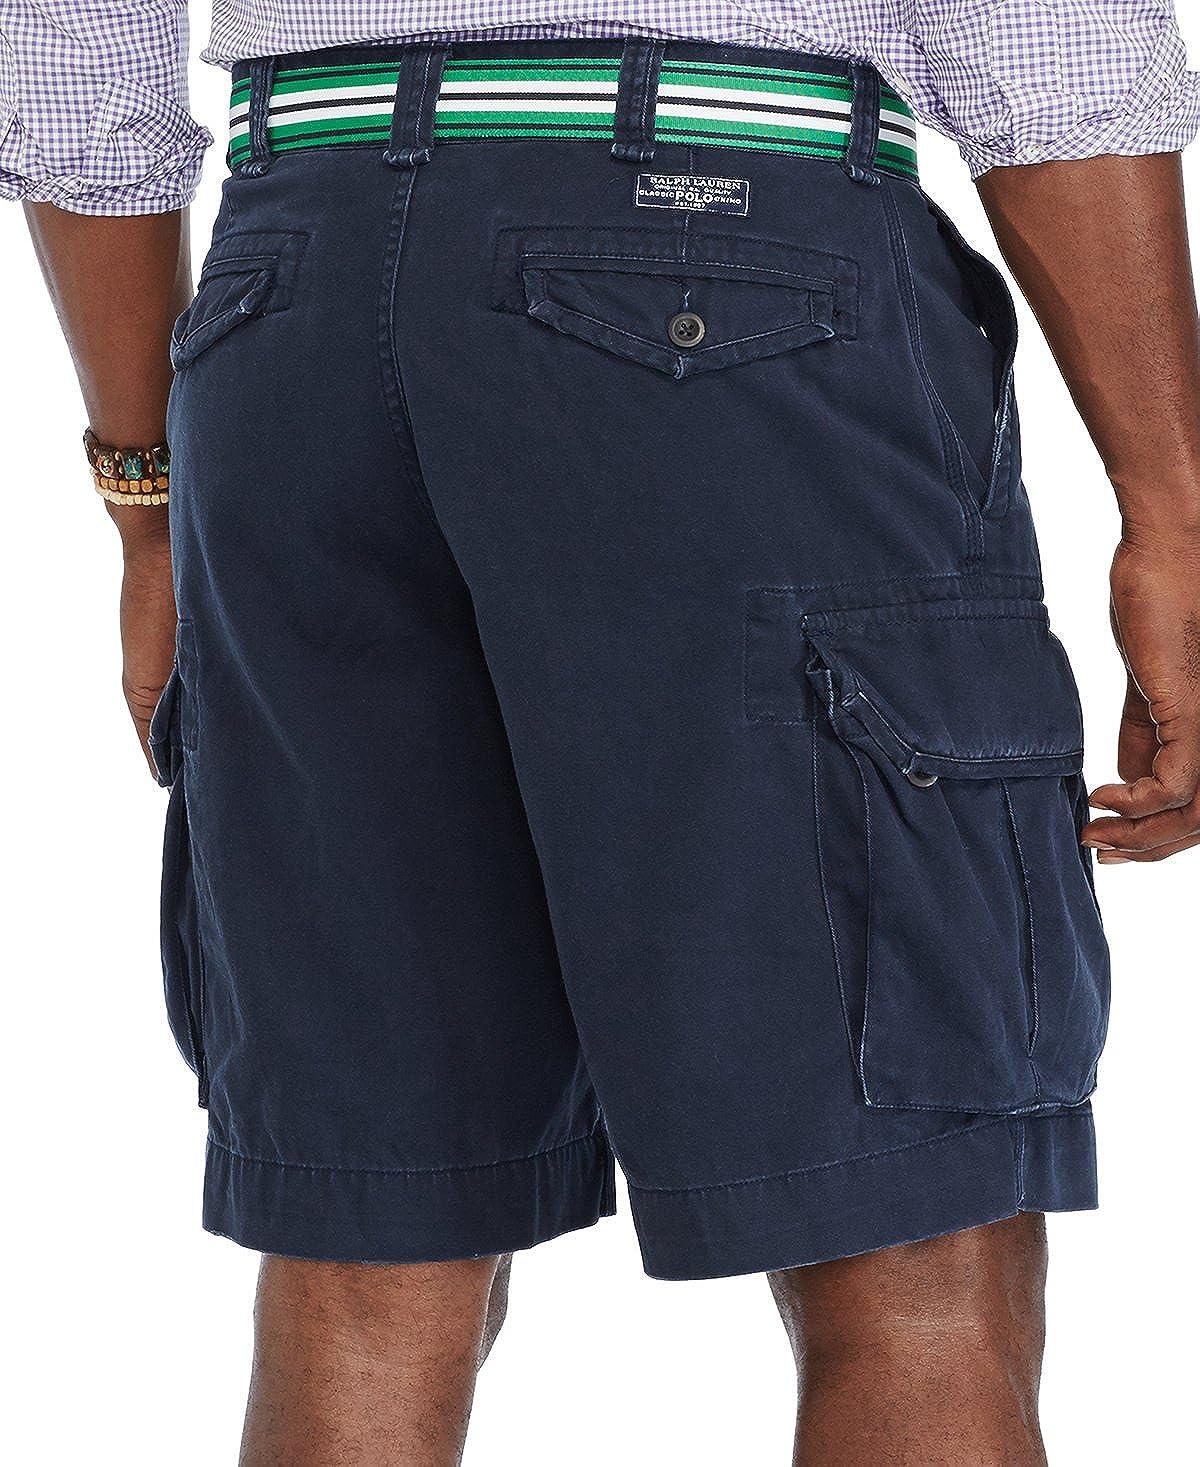 Polo Ralph Lauren Mens Fit Commander Cargo Shorts